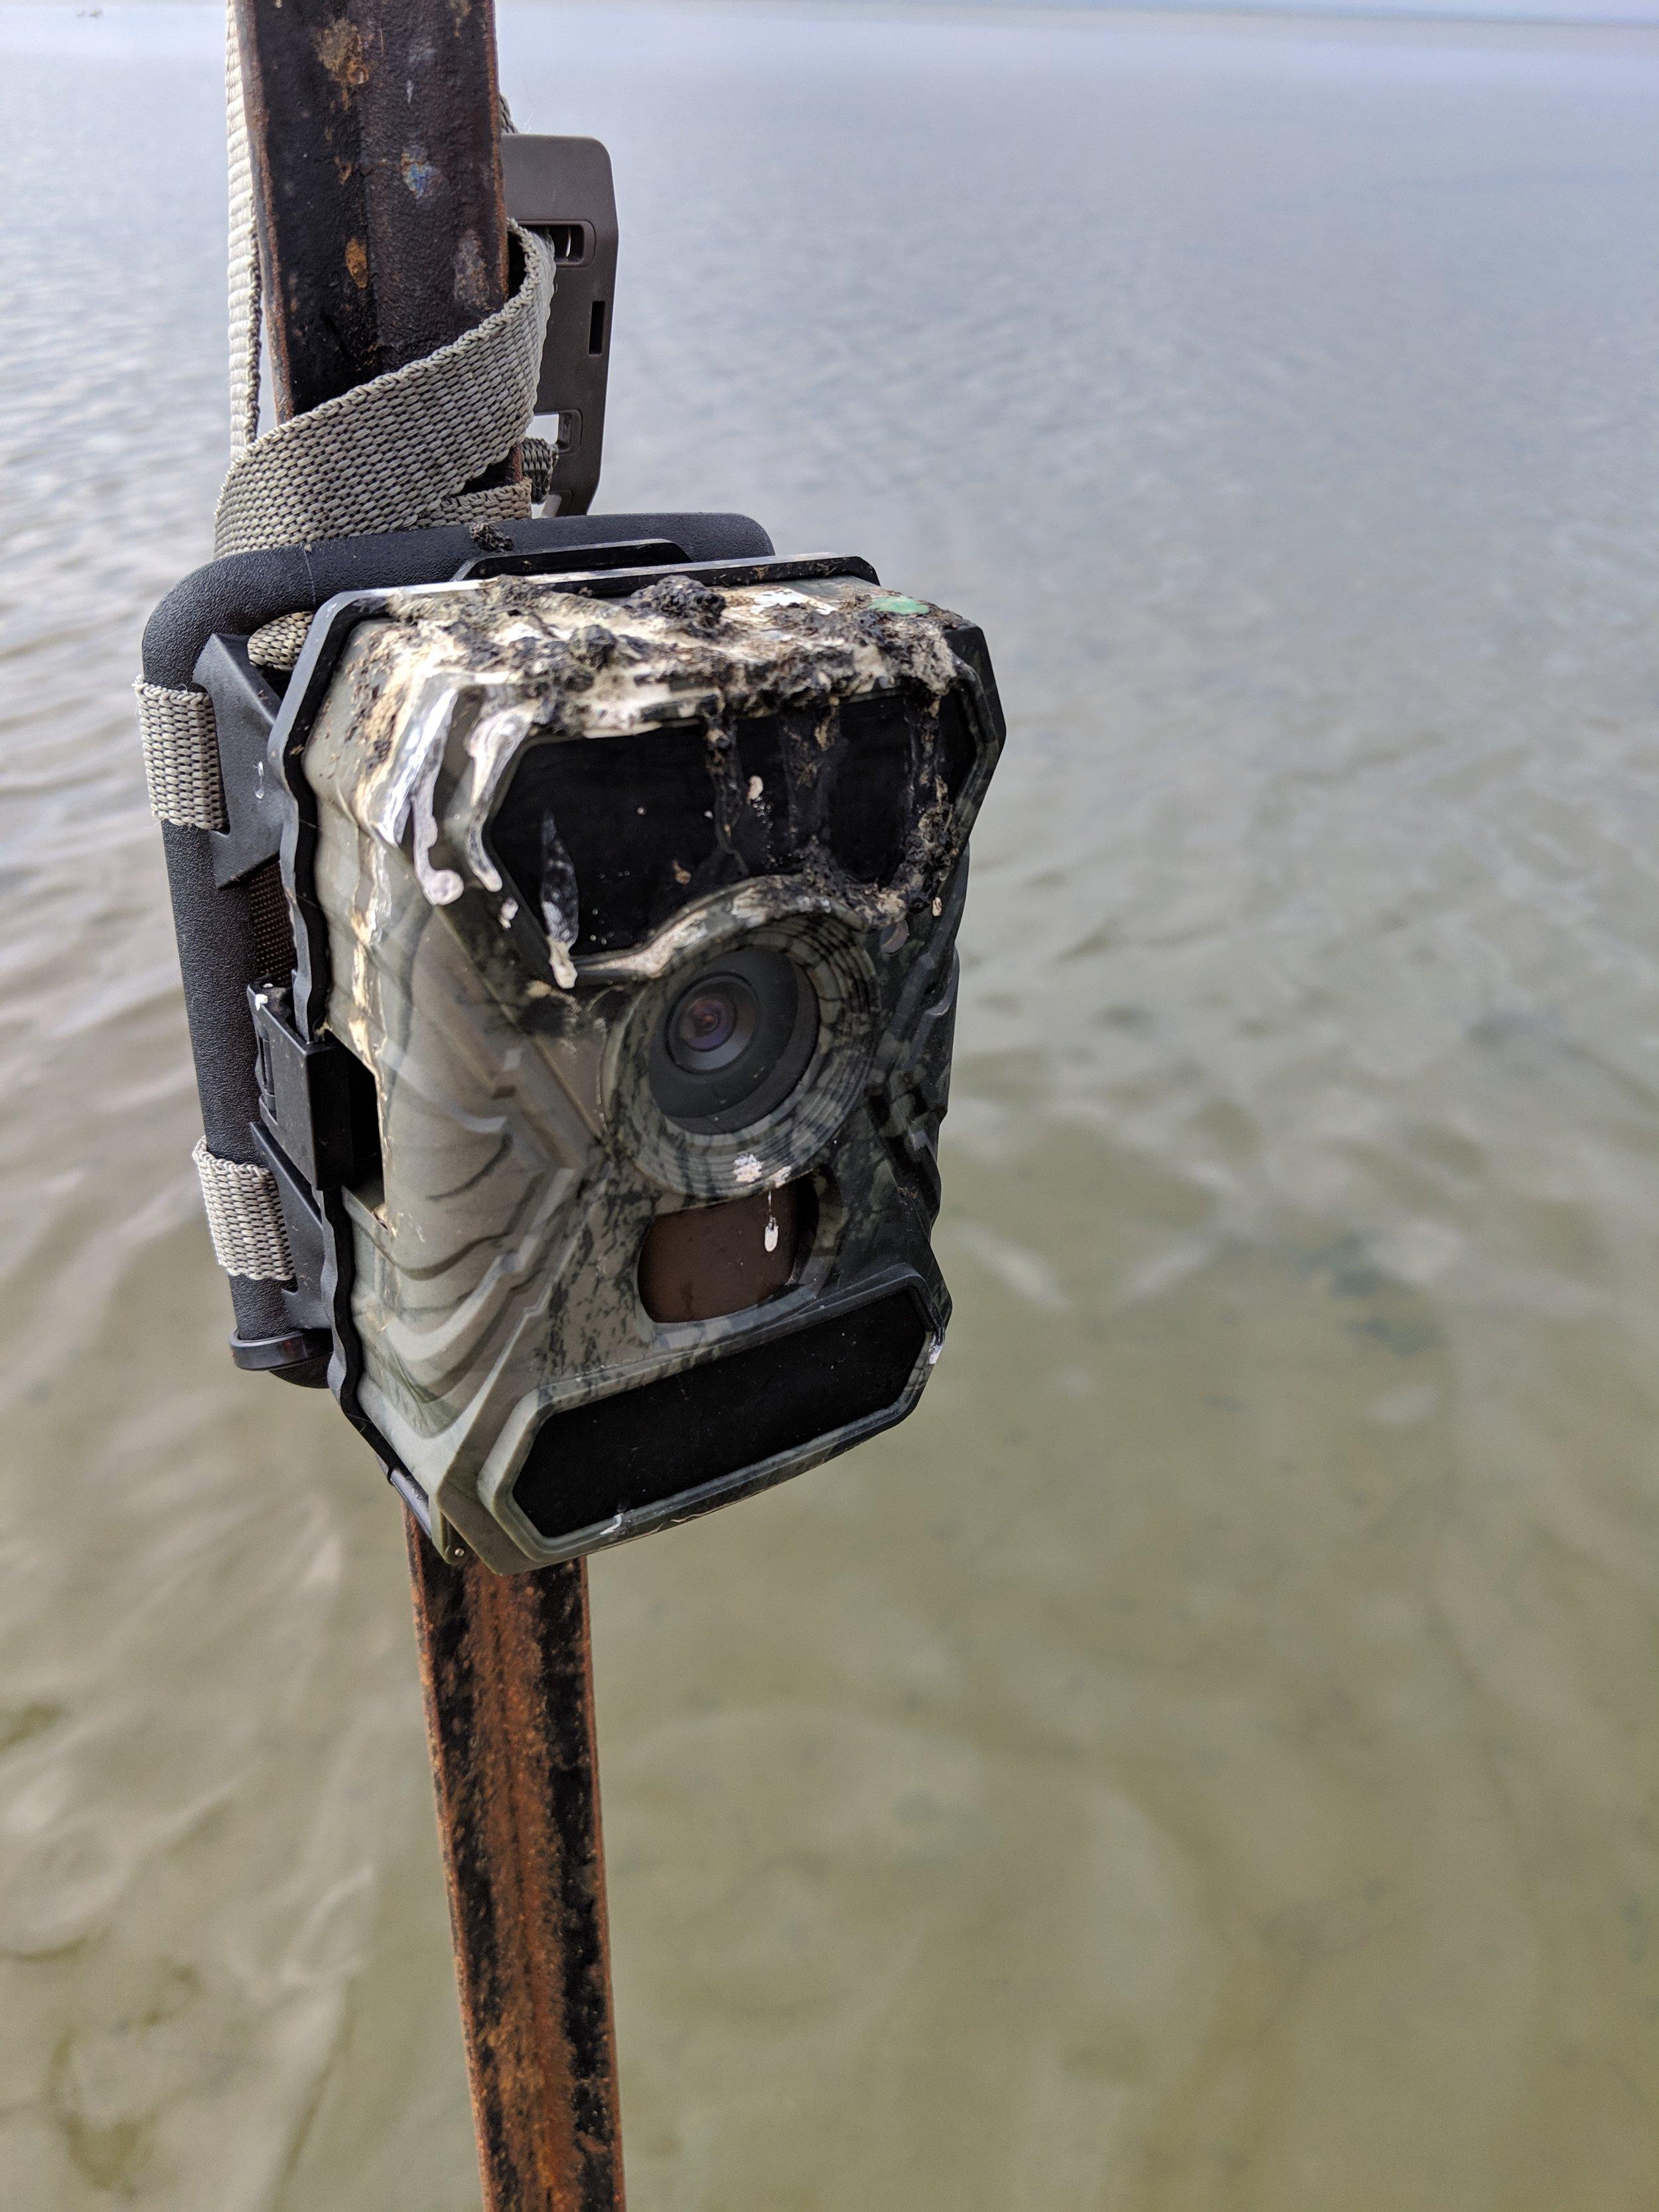 birds provide feedback on the remote cameras